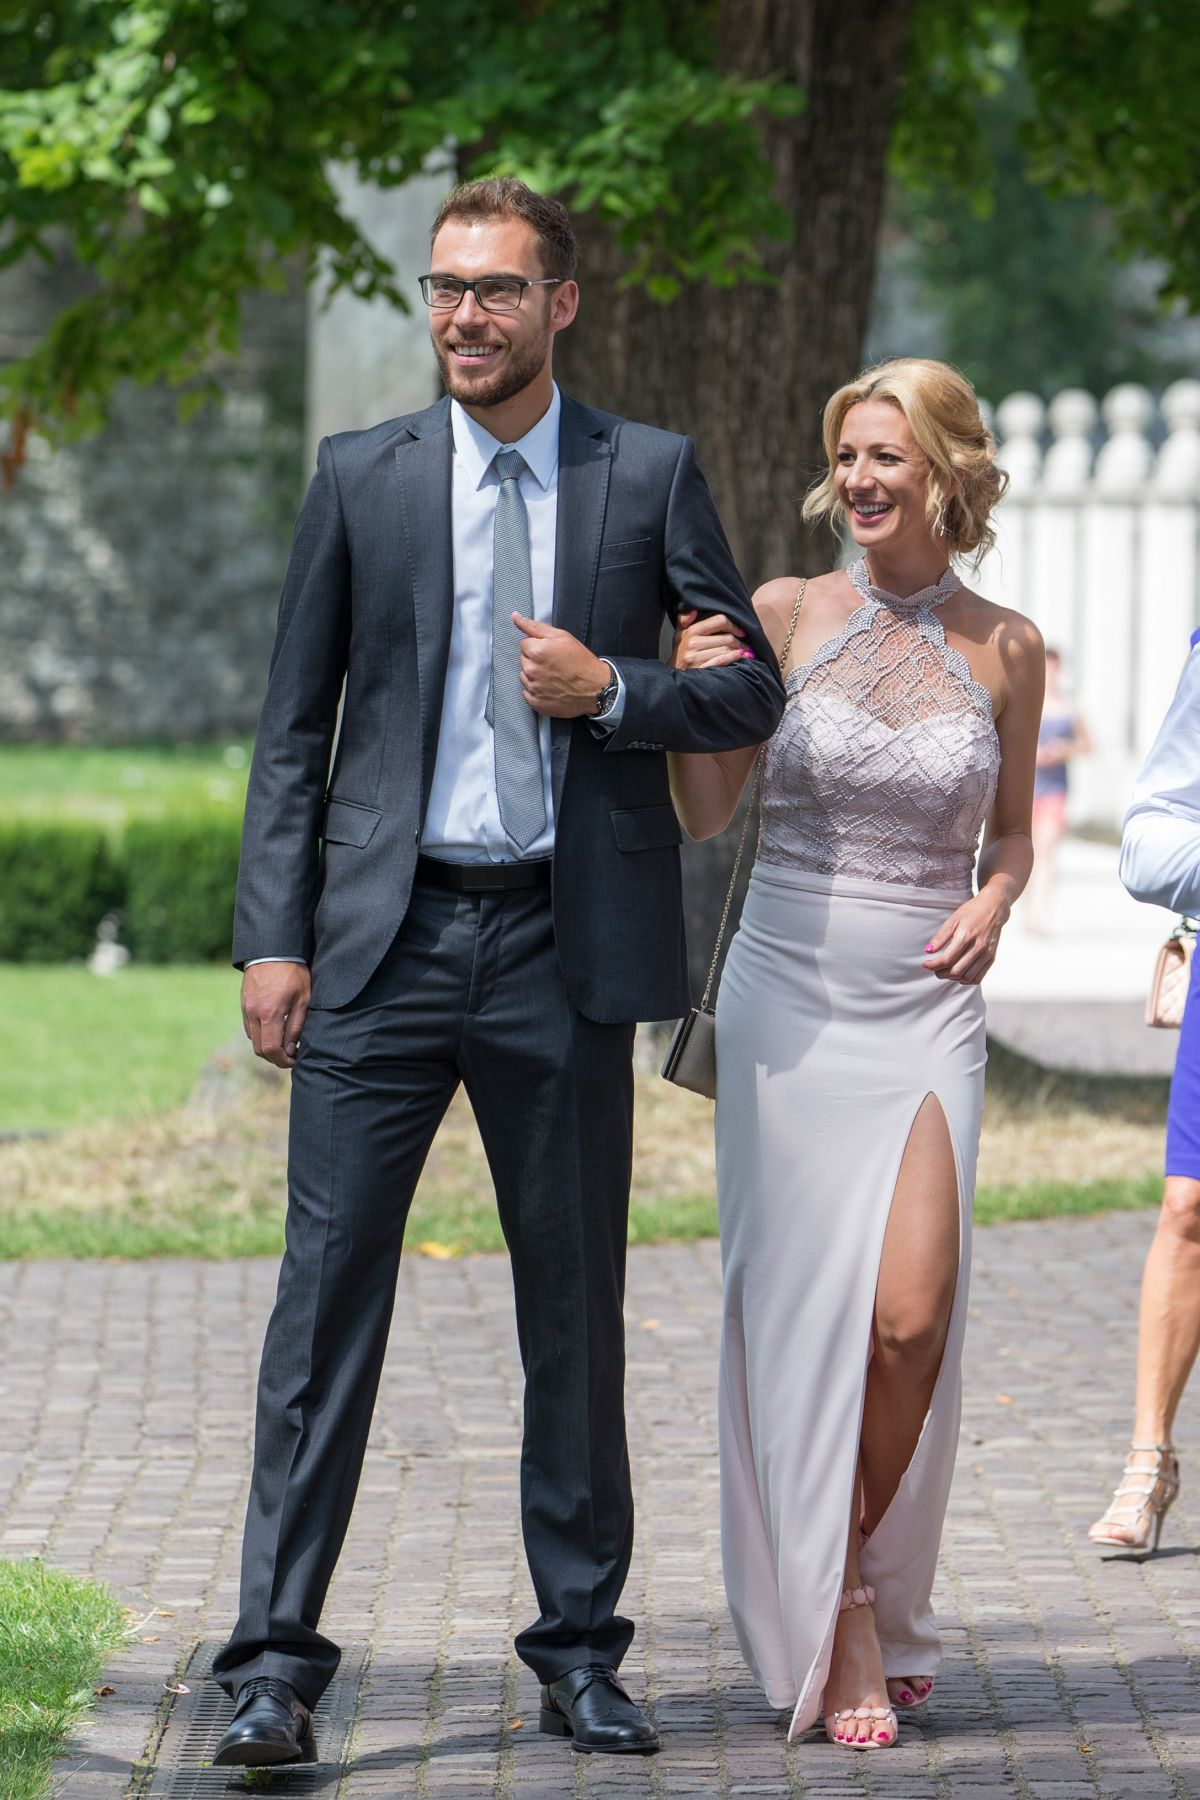 MARTA DOMACHOW at Agnieszka Radwanska Wedding in Cracow 07/22/2017